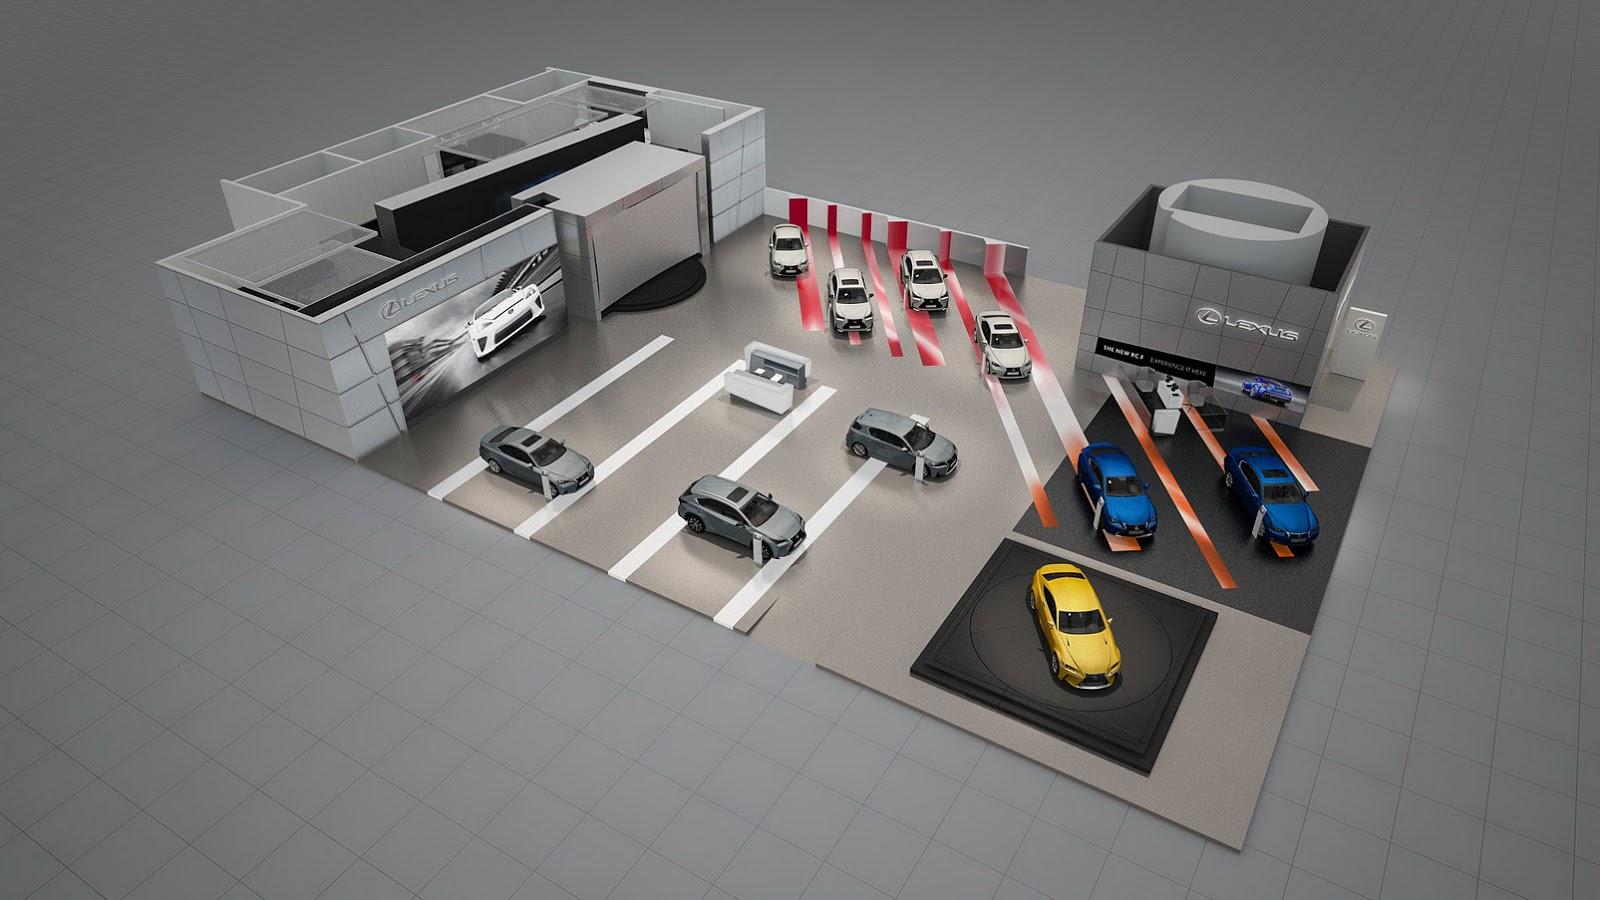 lexus - 2015 - [Lexus] LF-SA Concept Lexus-Geneva-2015_2